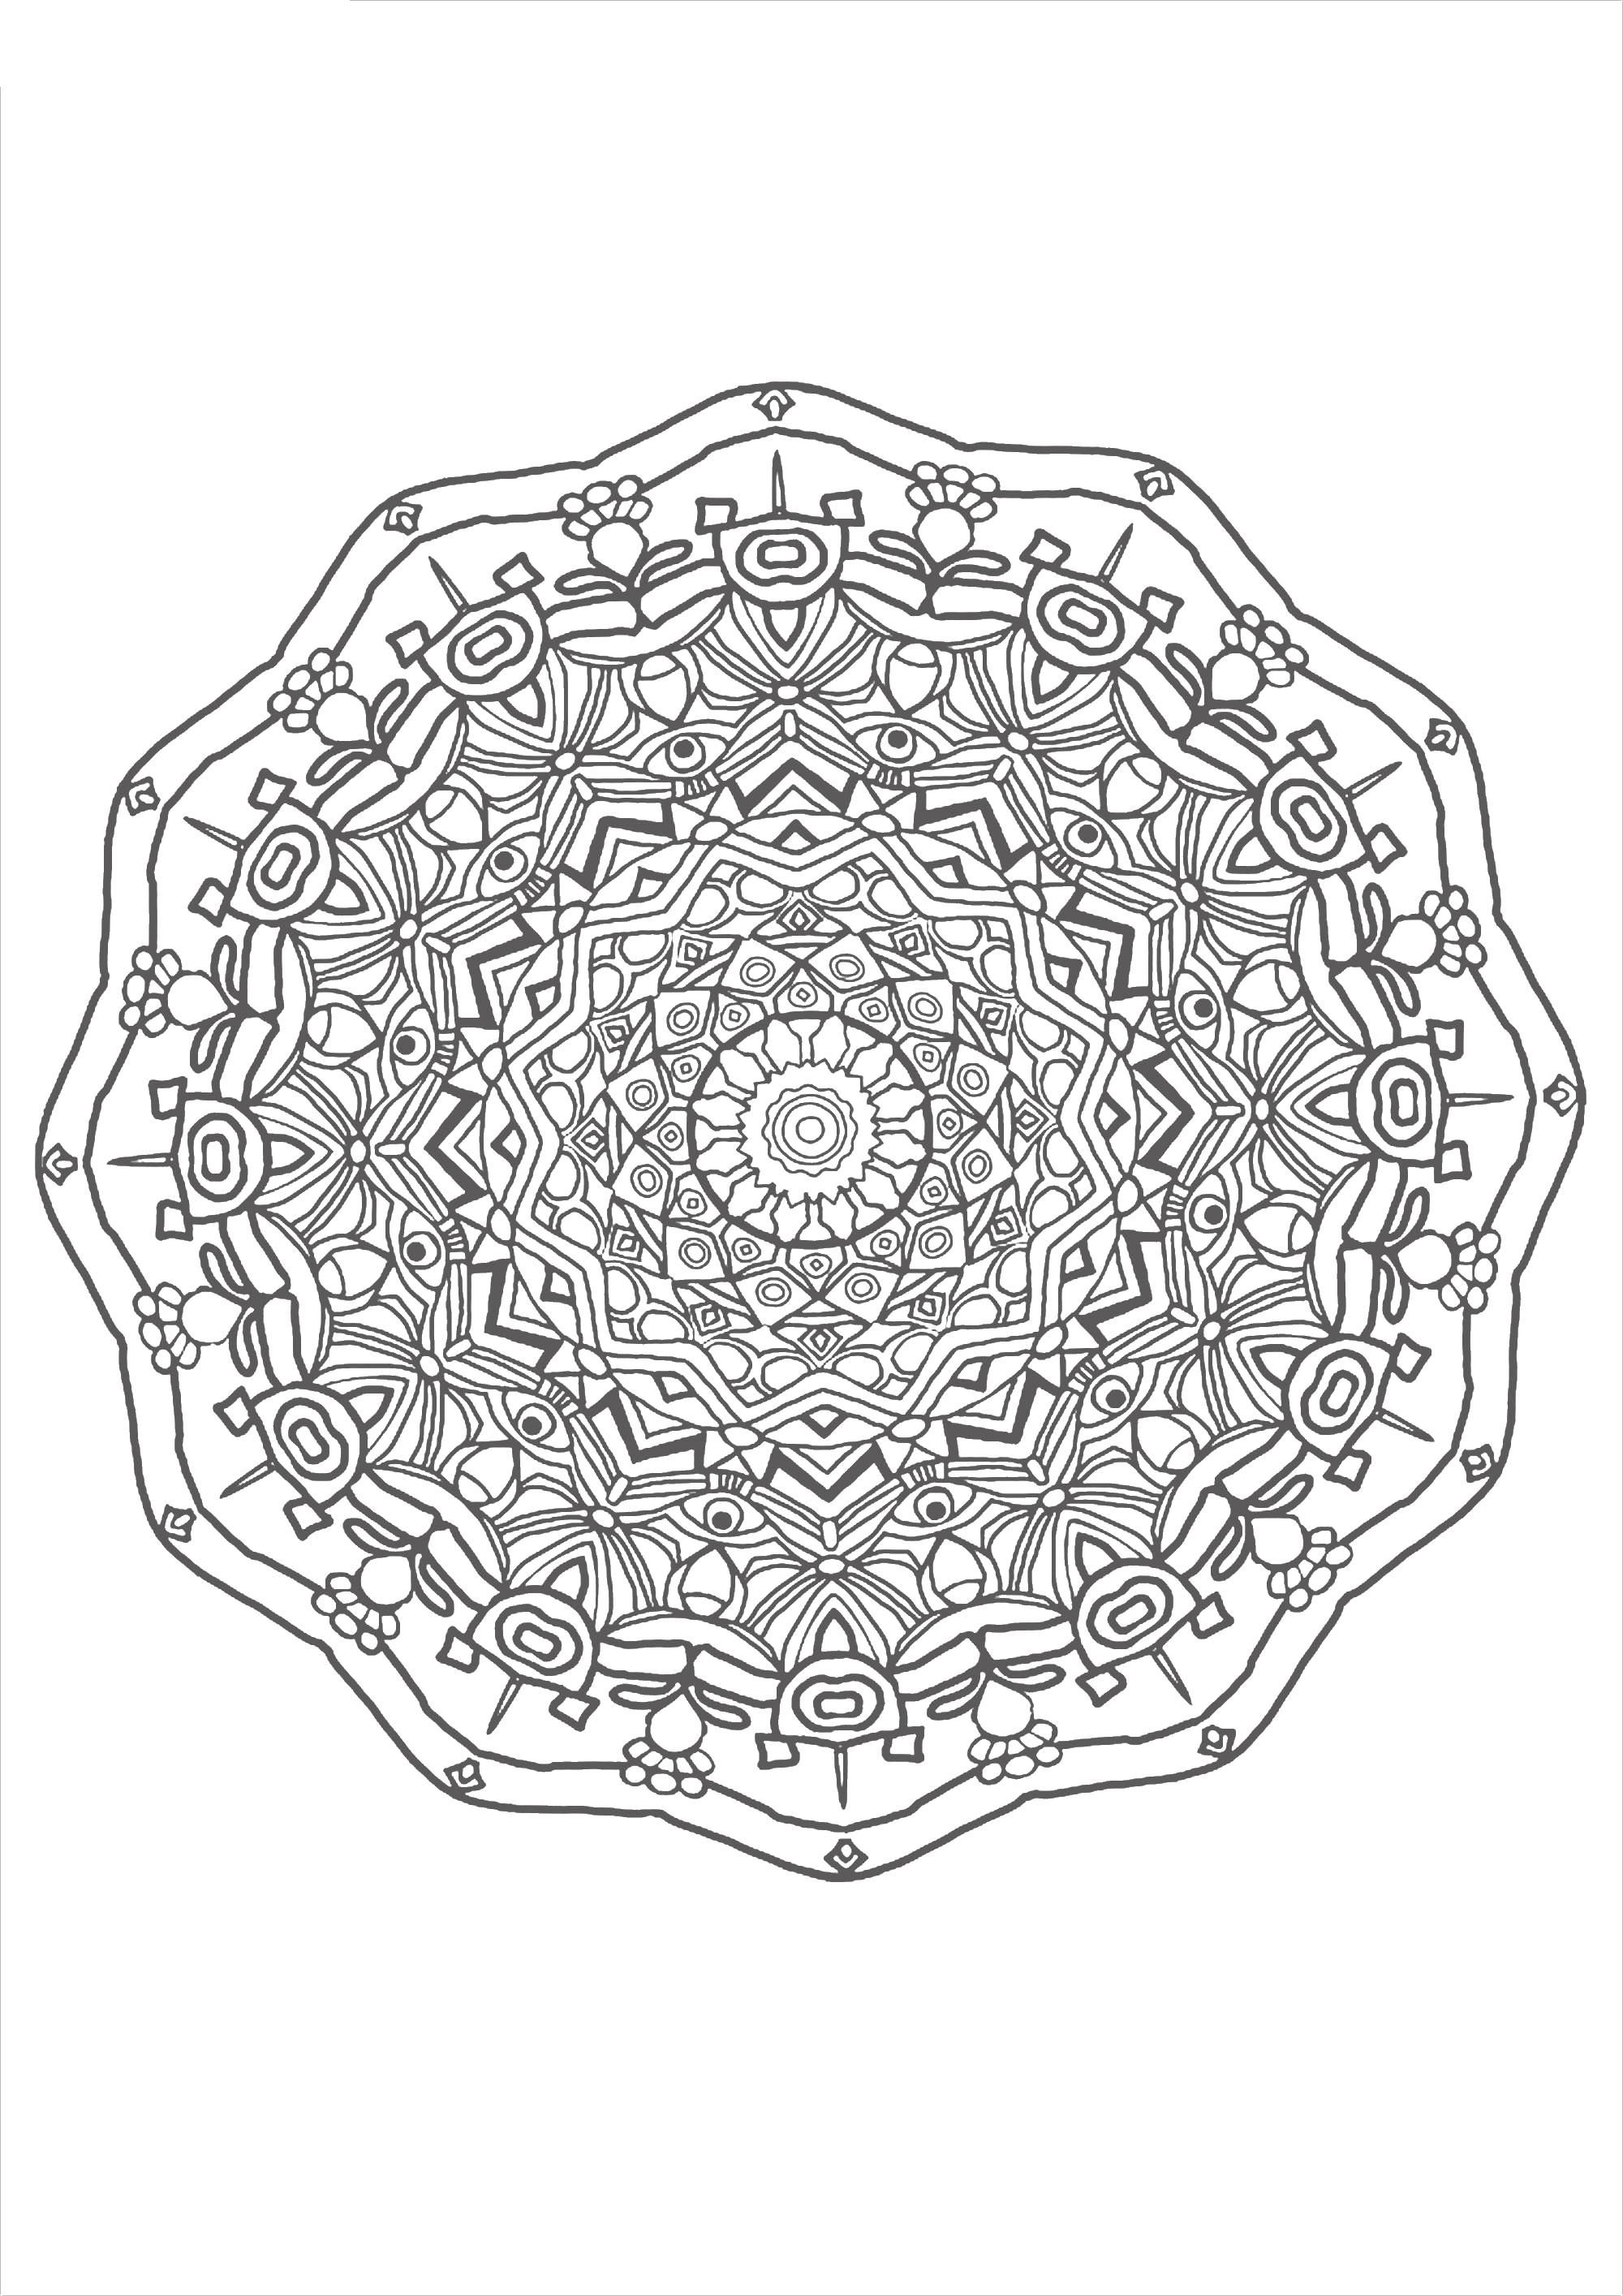 Узоры в круге | Раскраски, Узоры, Мандала